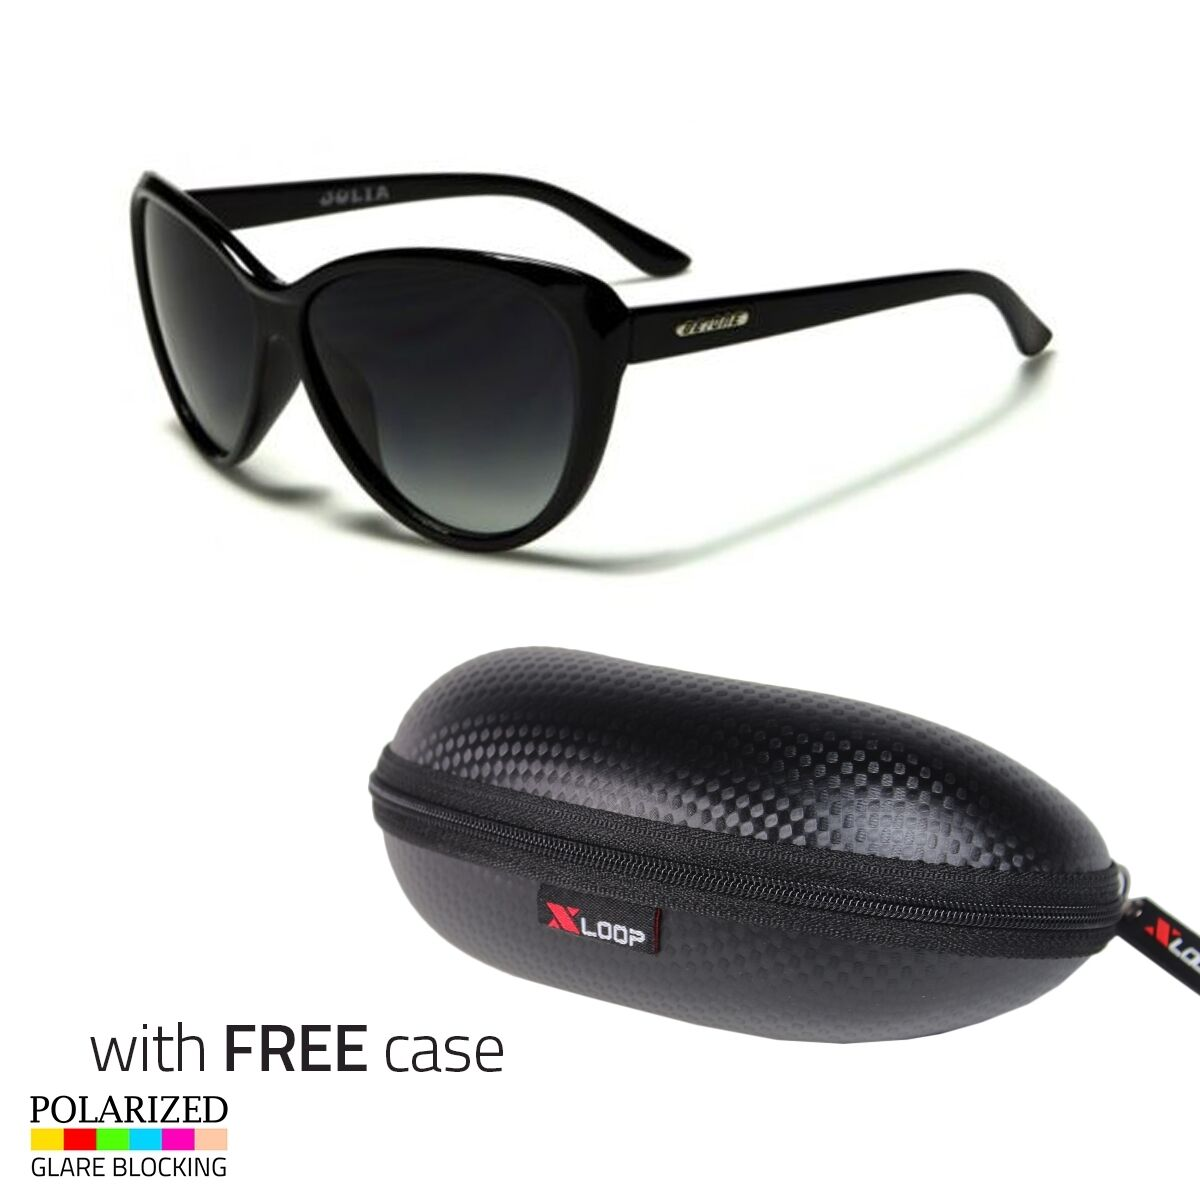 Black Cat Eye POLARIZED Sunglasses Retro Classic Vintage Des